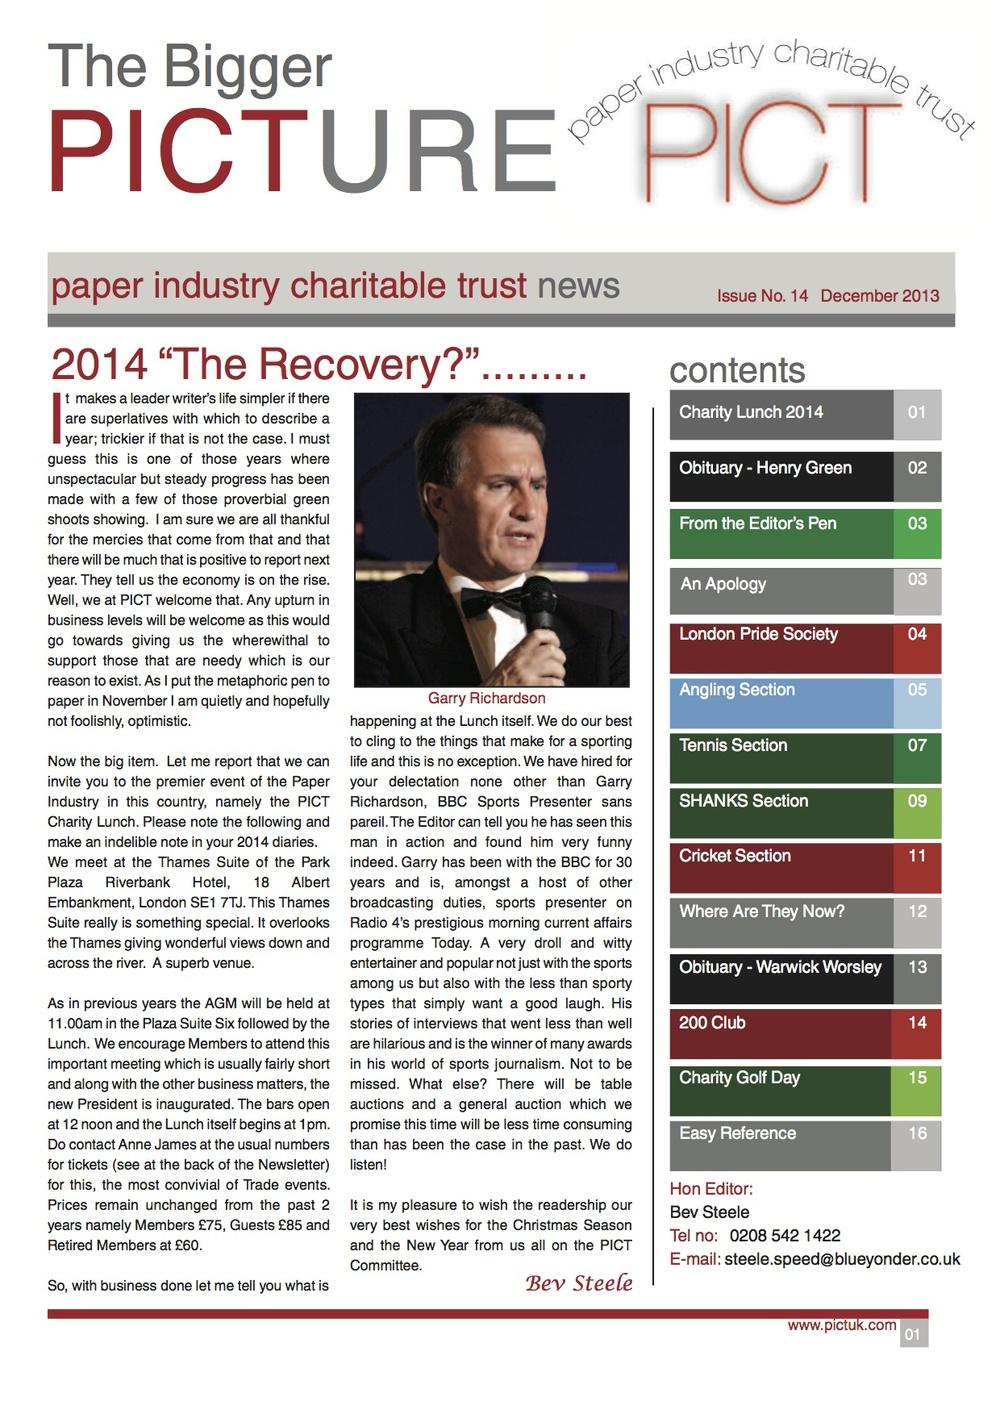 Issue 14 - December 2013